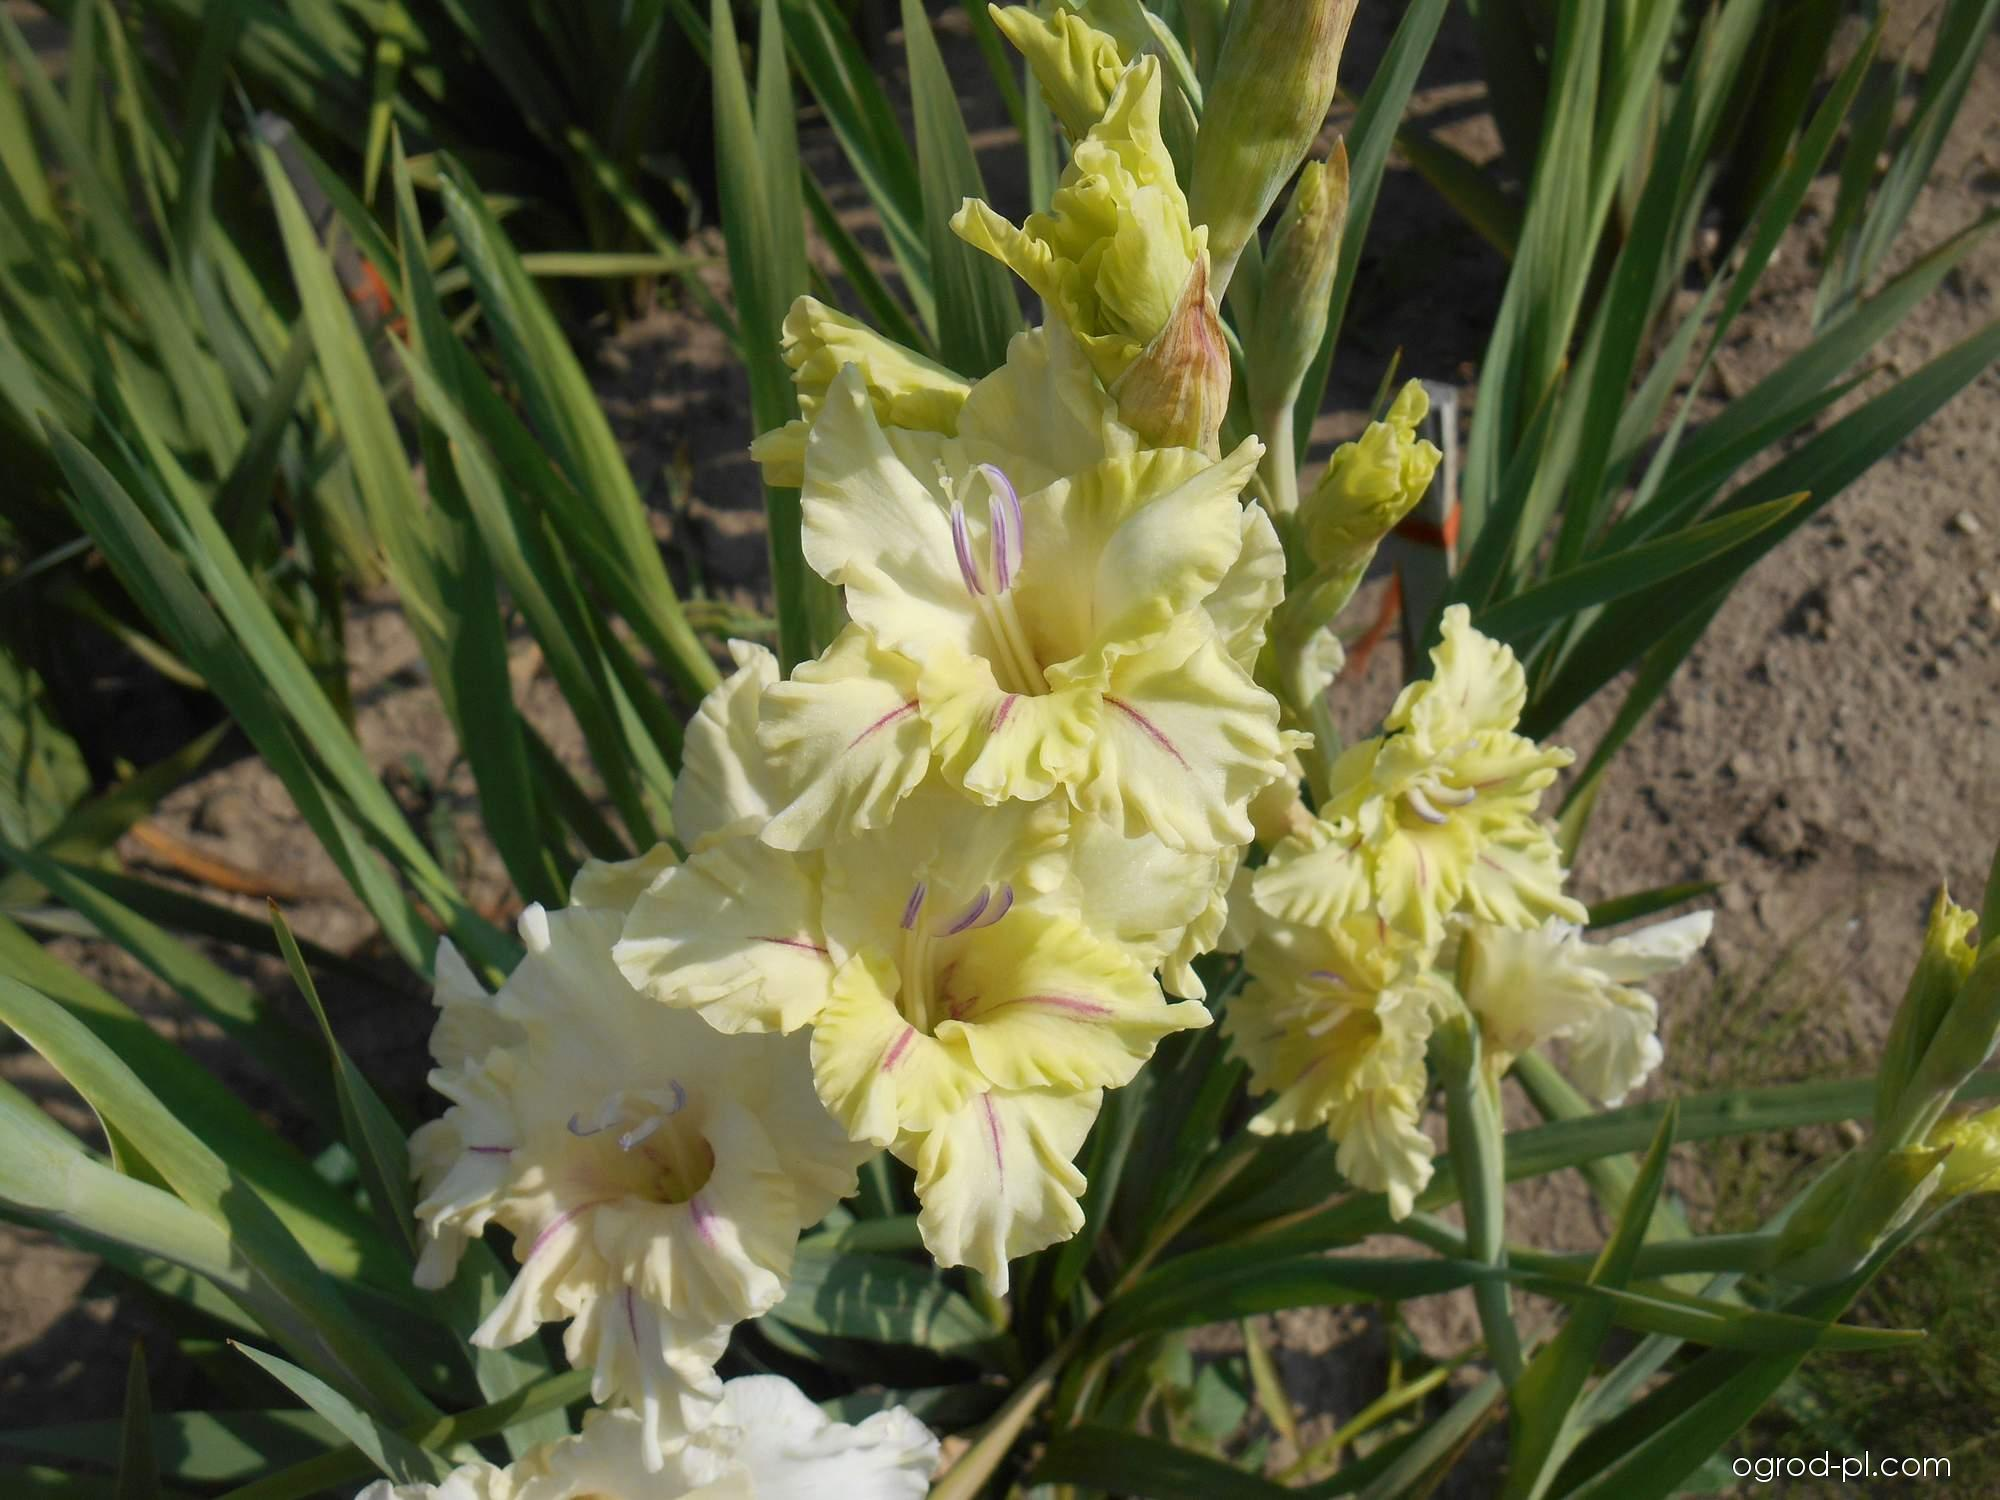 Mieczyk - Gladiolus Cecilka